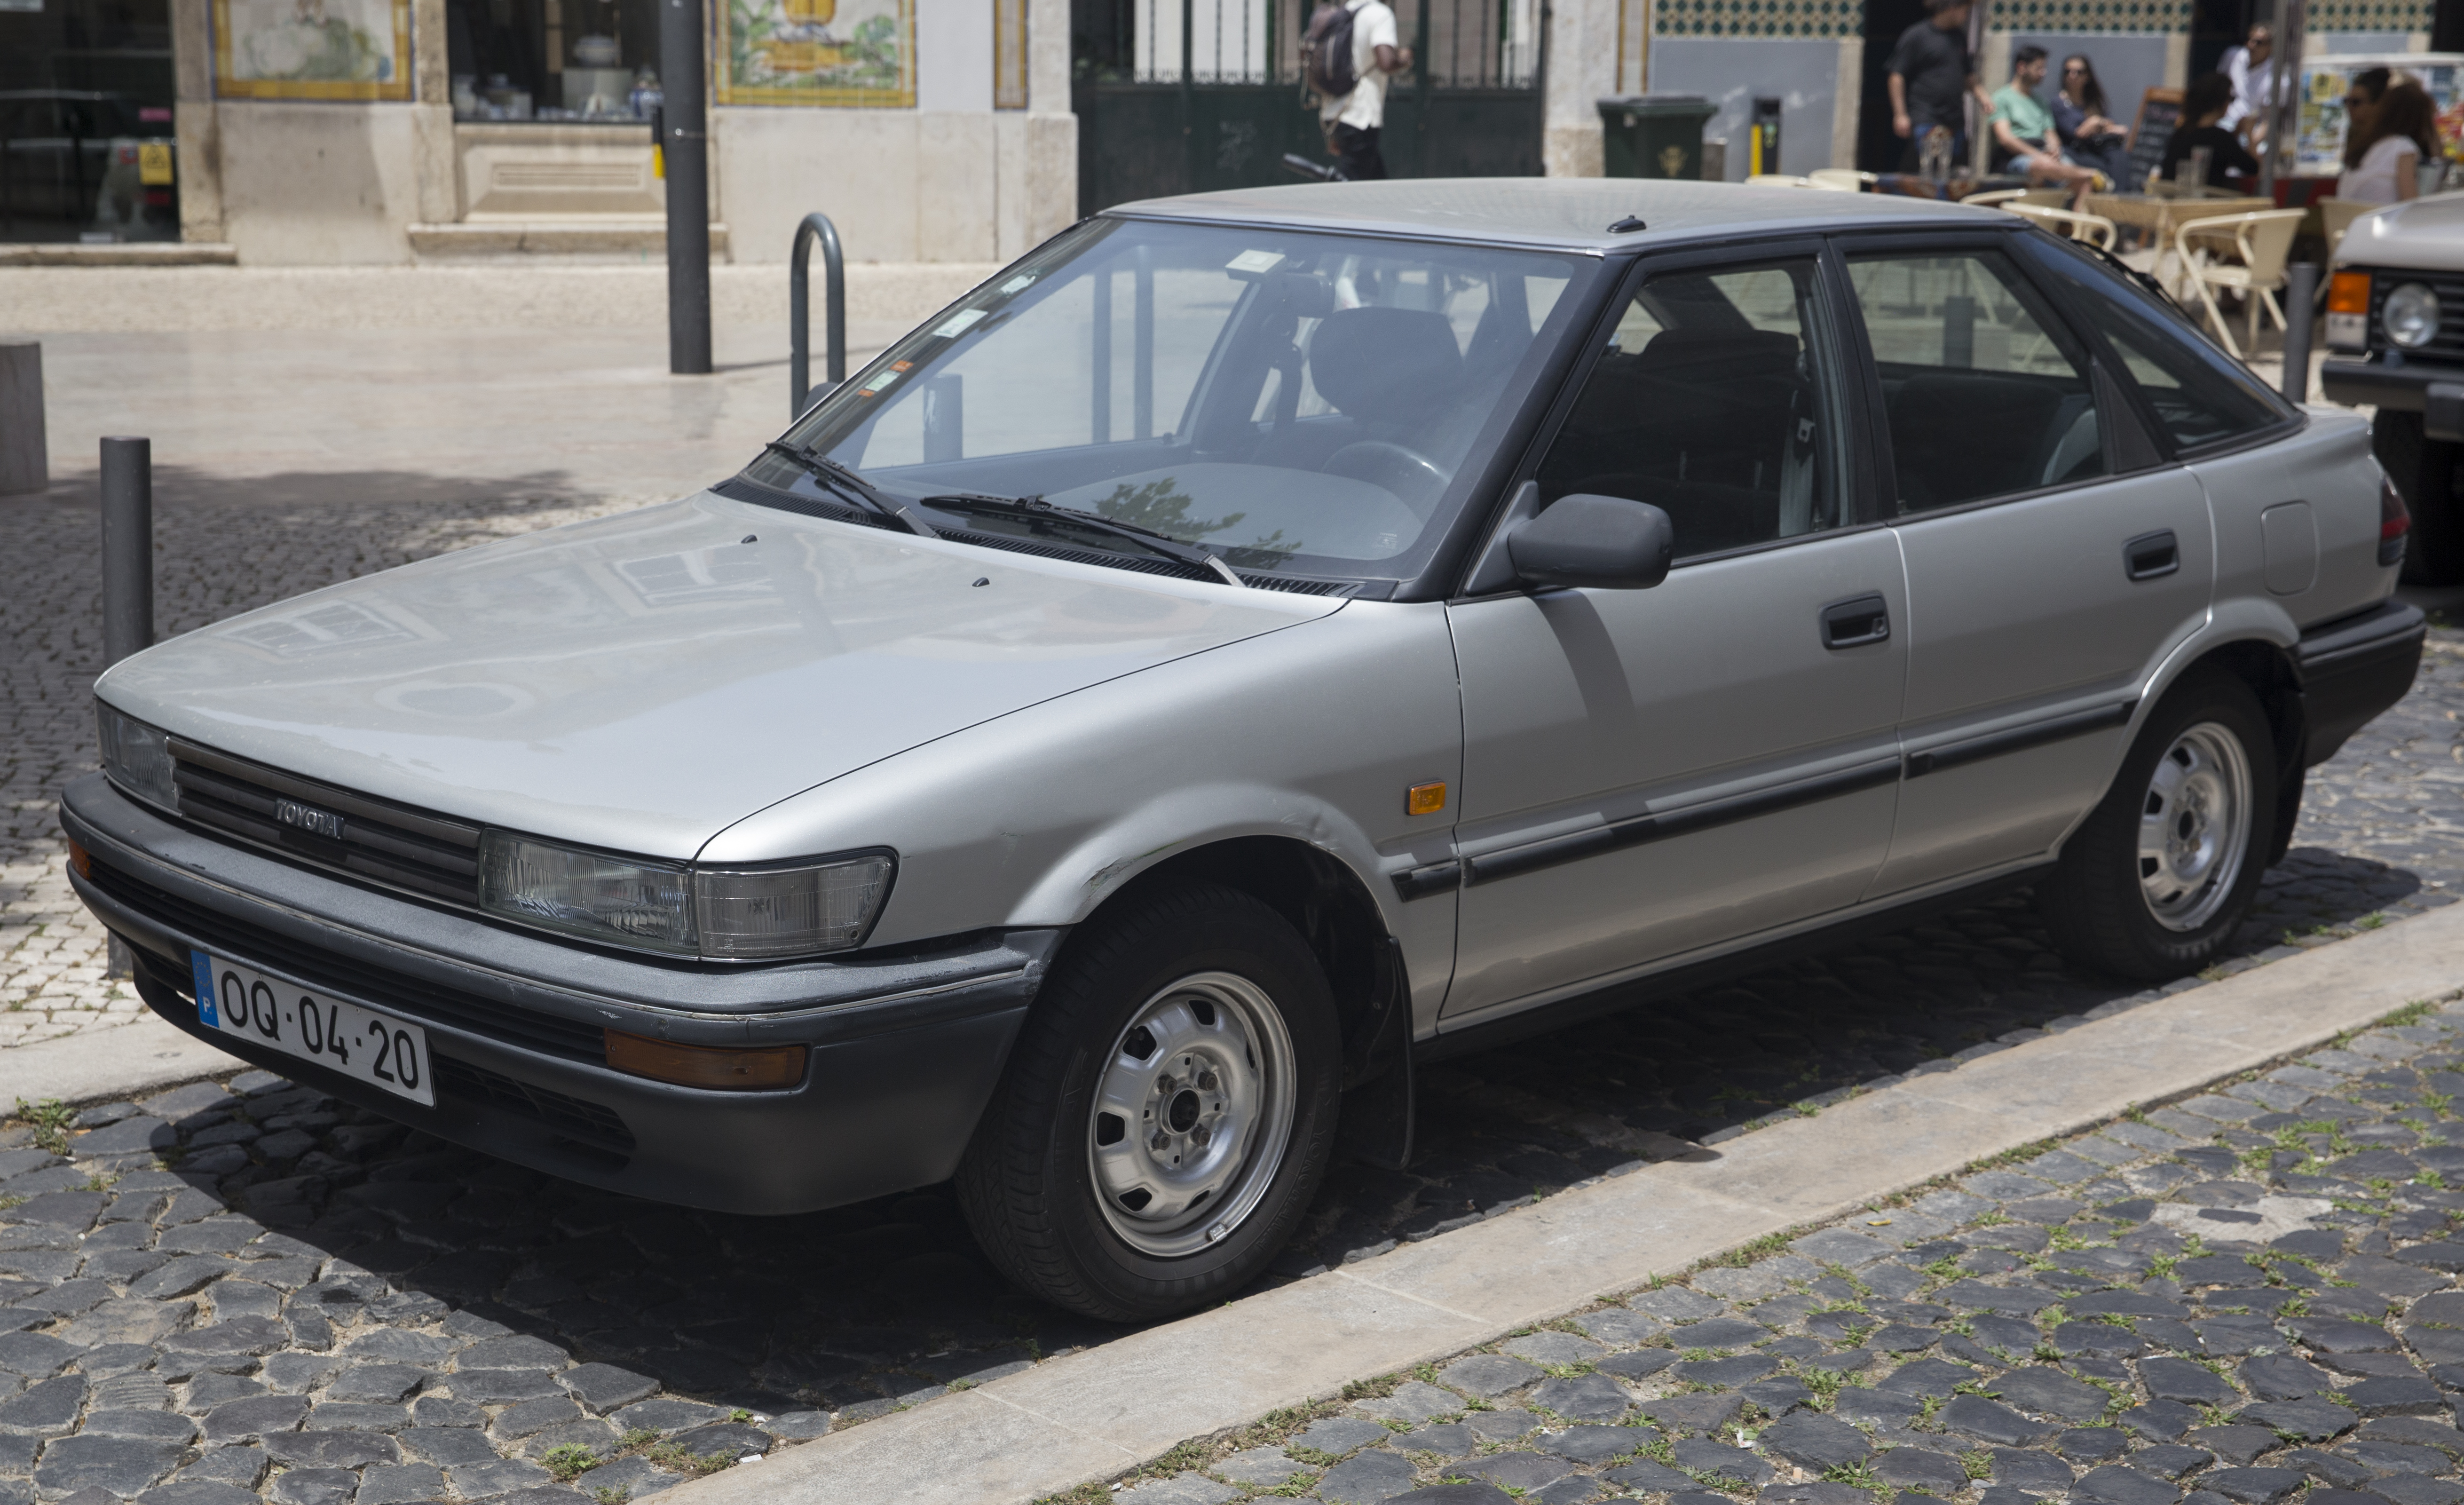 Toyota Sprinter Carib I 1982 - 1988 Station wagon 5 door #3